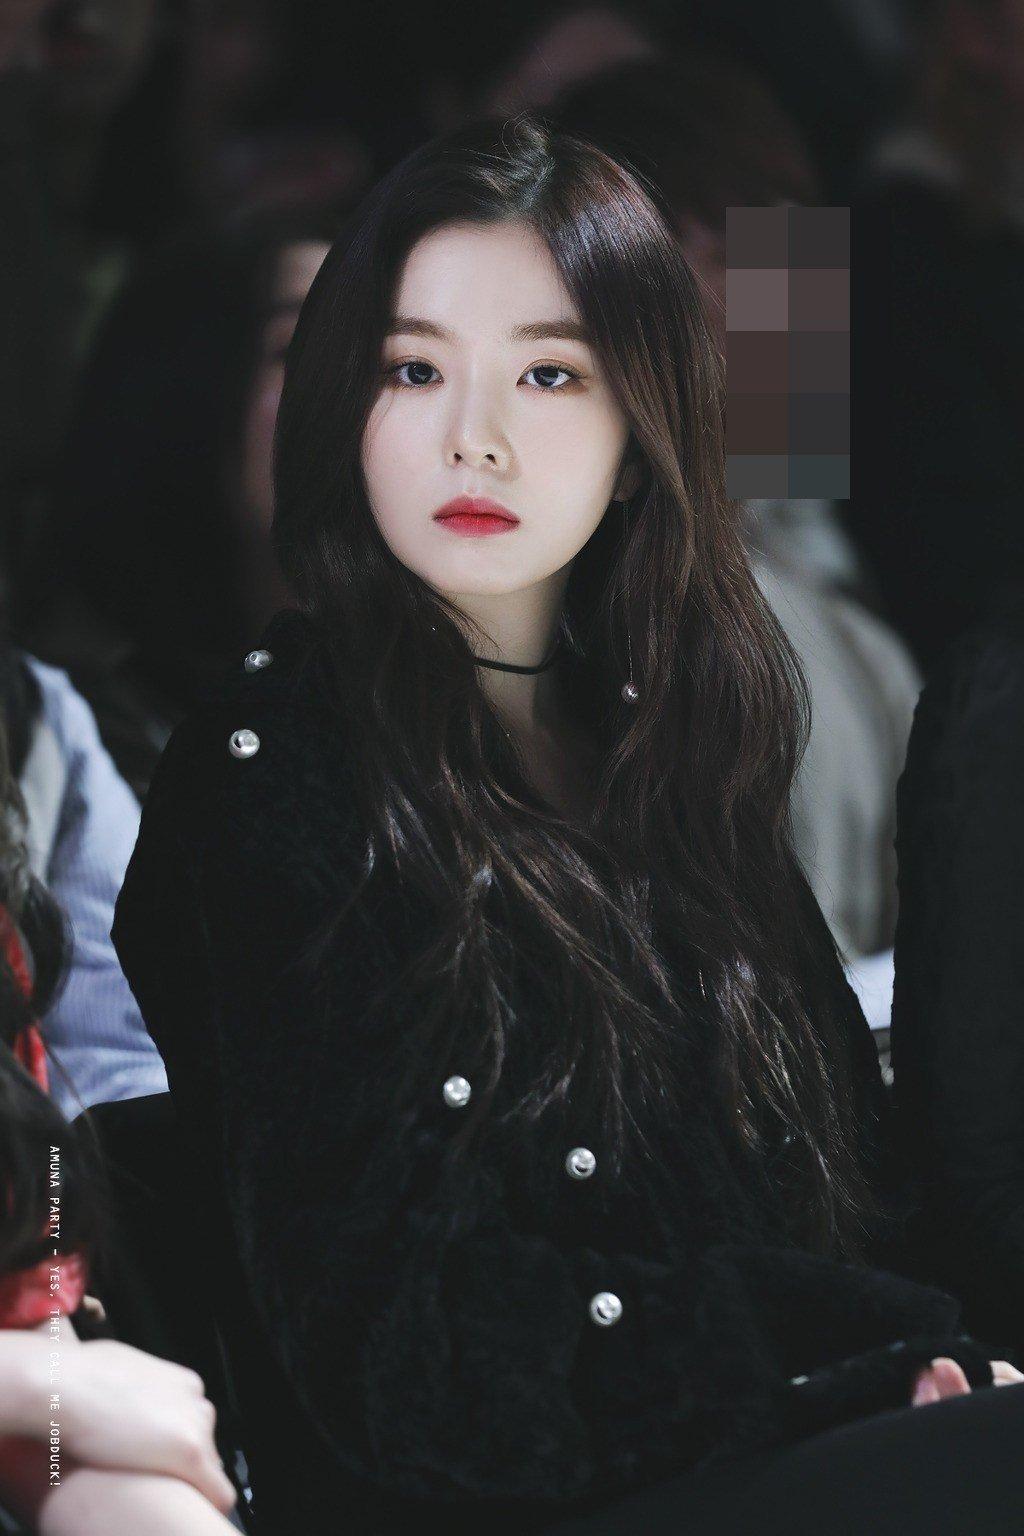 Irene11